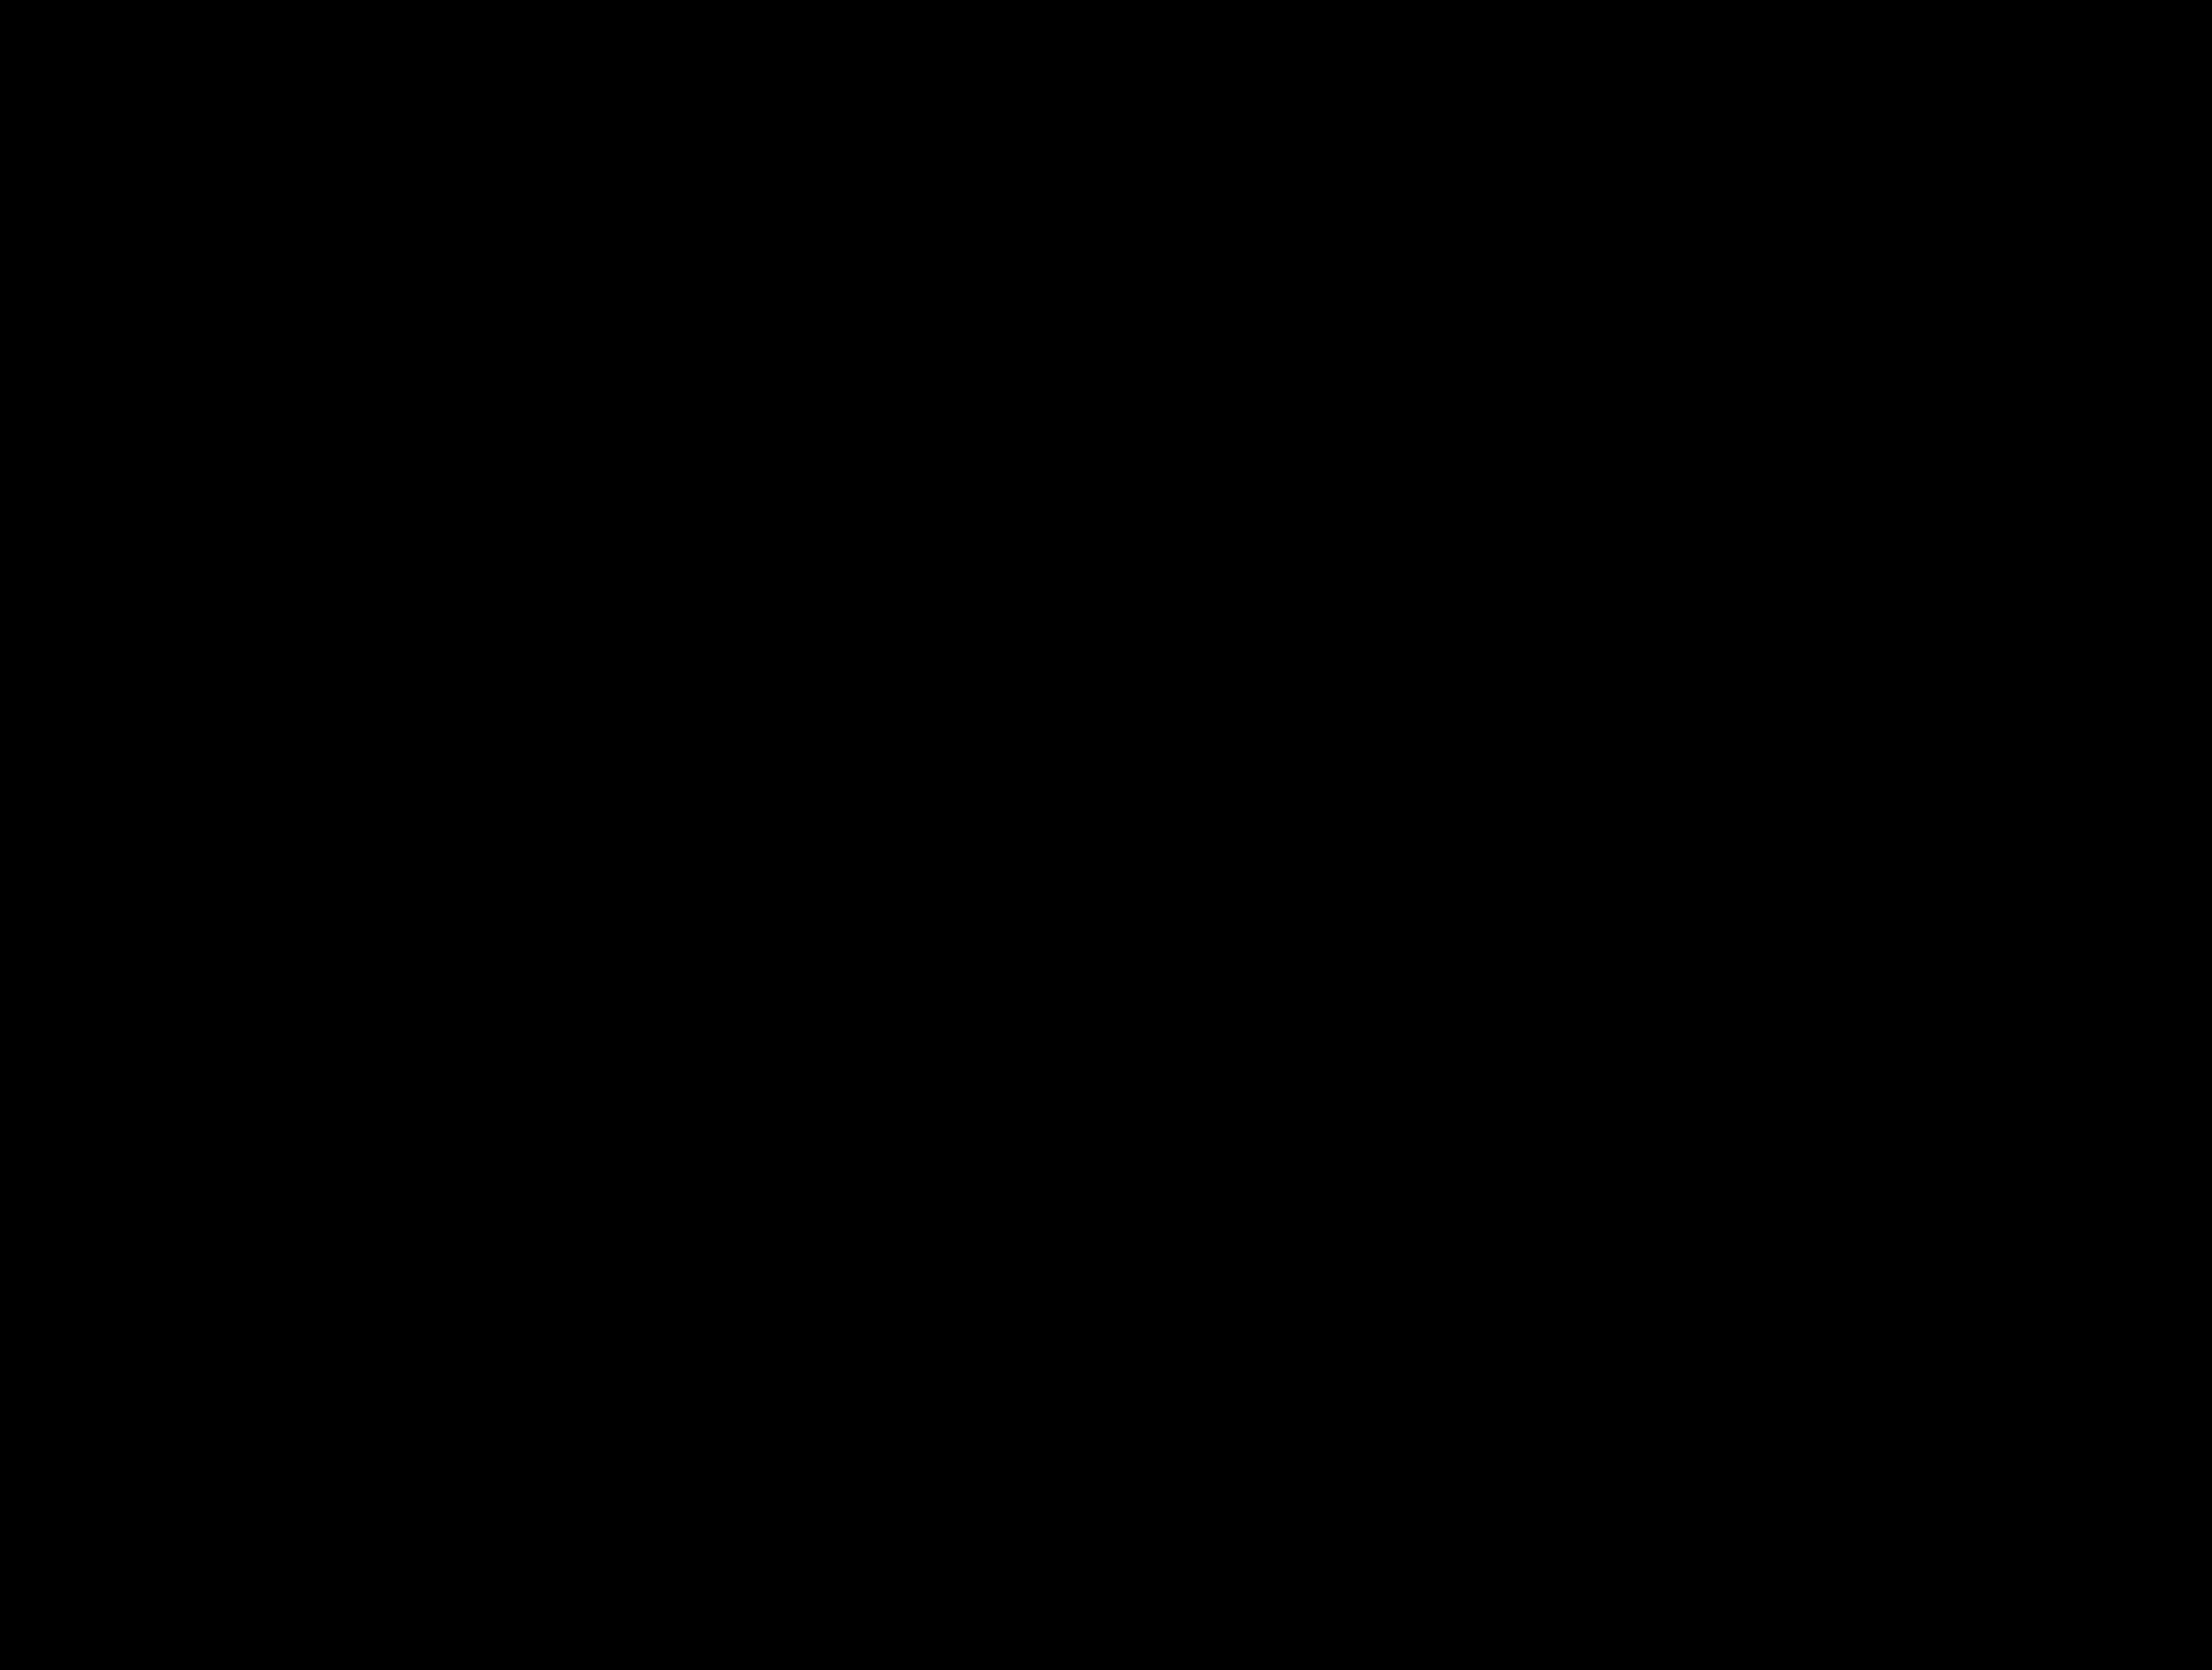 2328x1758 Clipart